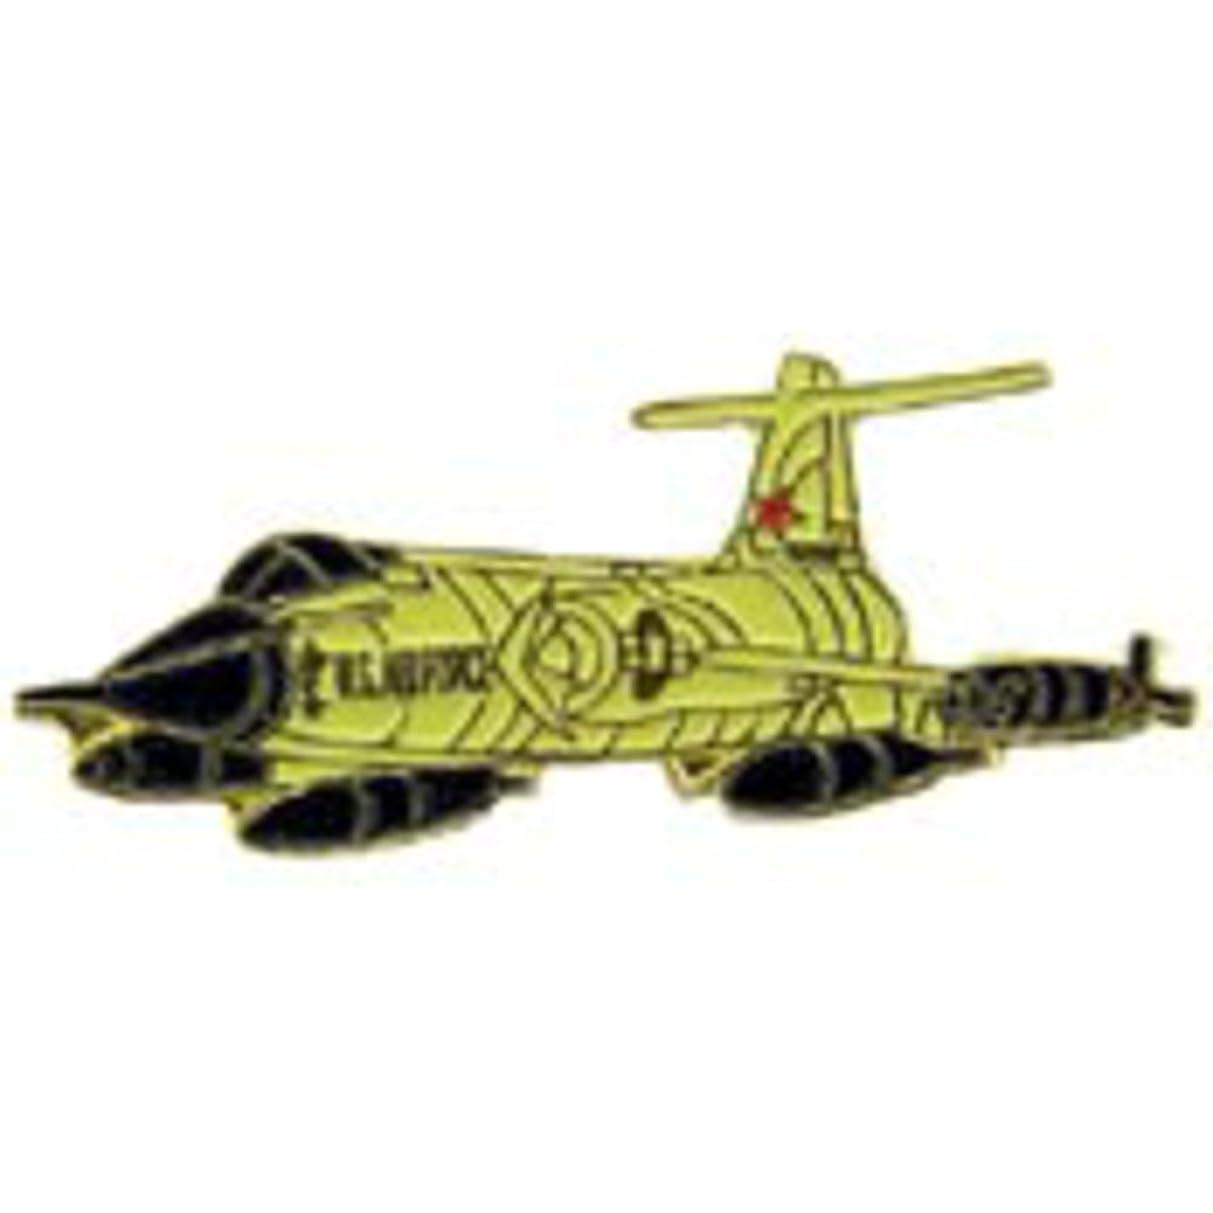 EagleEmblems P15917 Pin-Apl,F-104 Starfighter (1.5'')